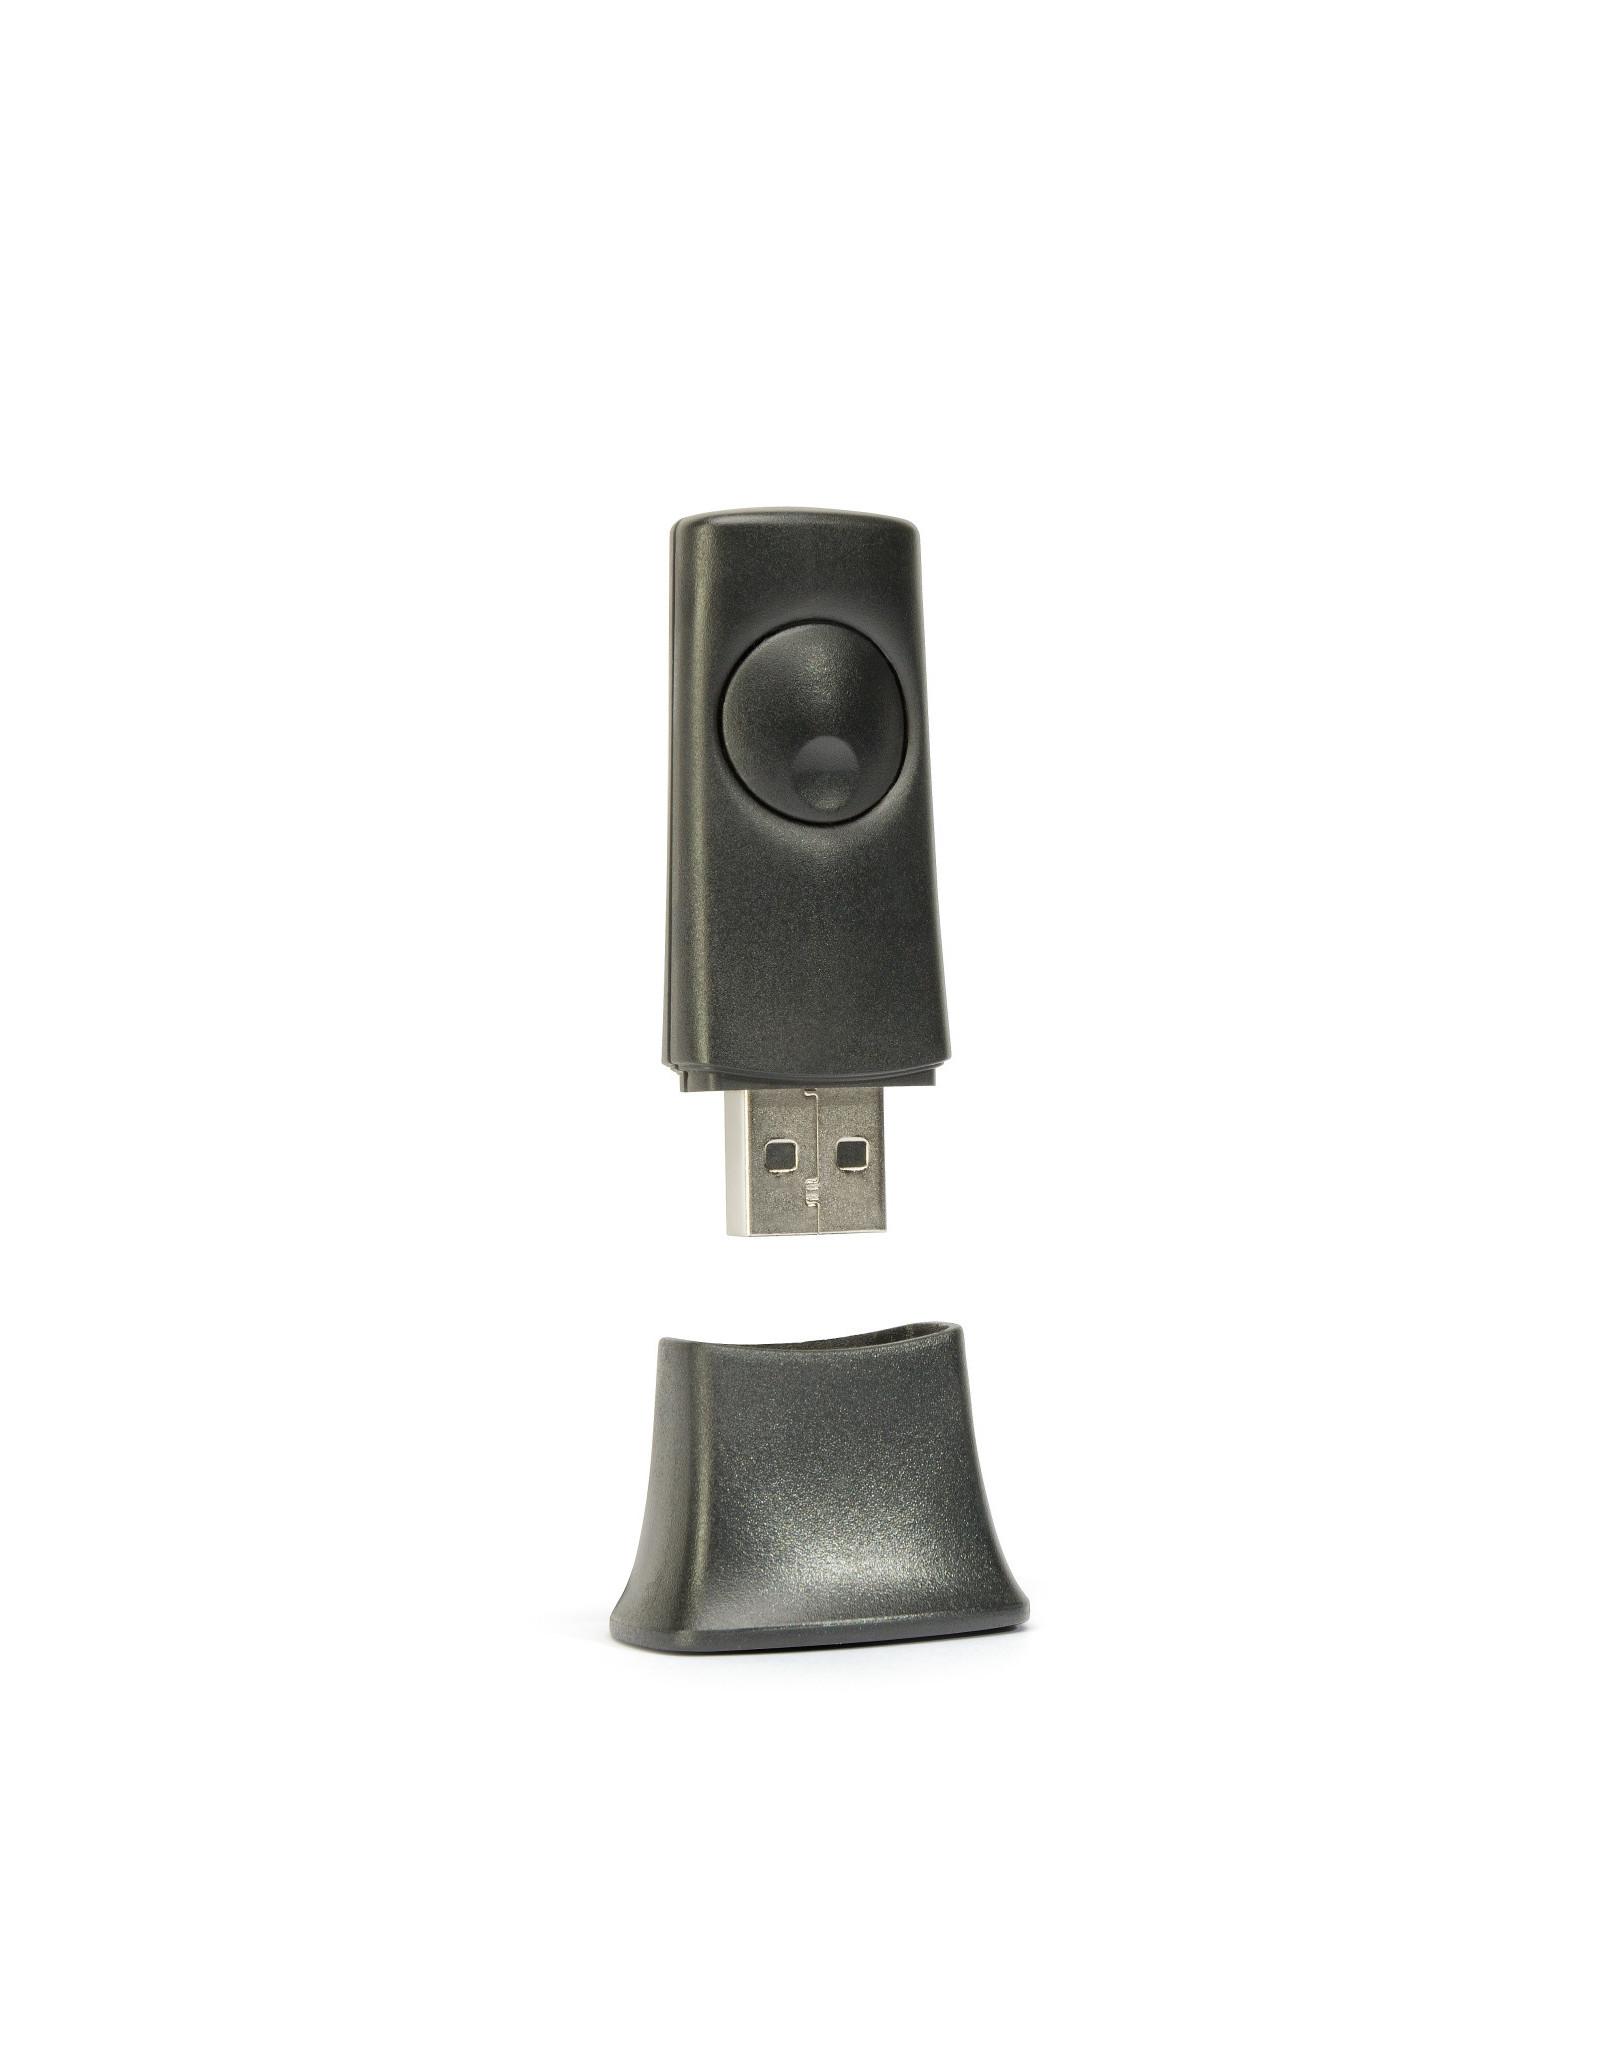 Cambridge Audio Cambridge Audio BT100 aptX Bluetooth Dongle